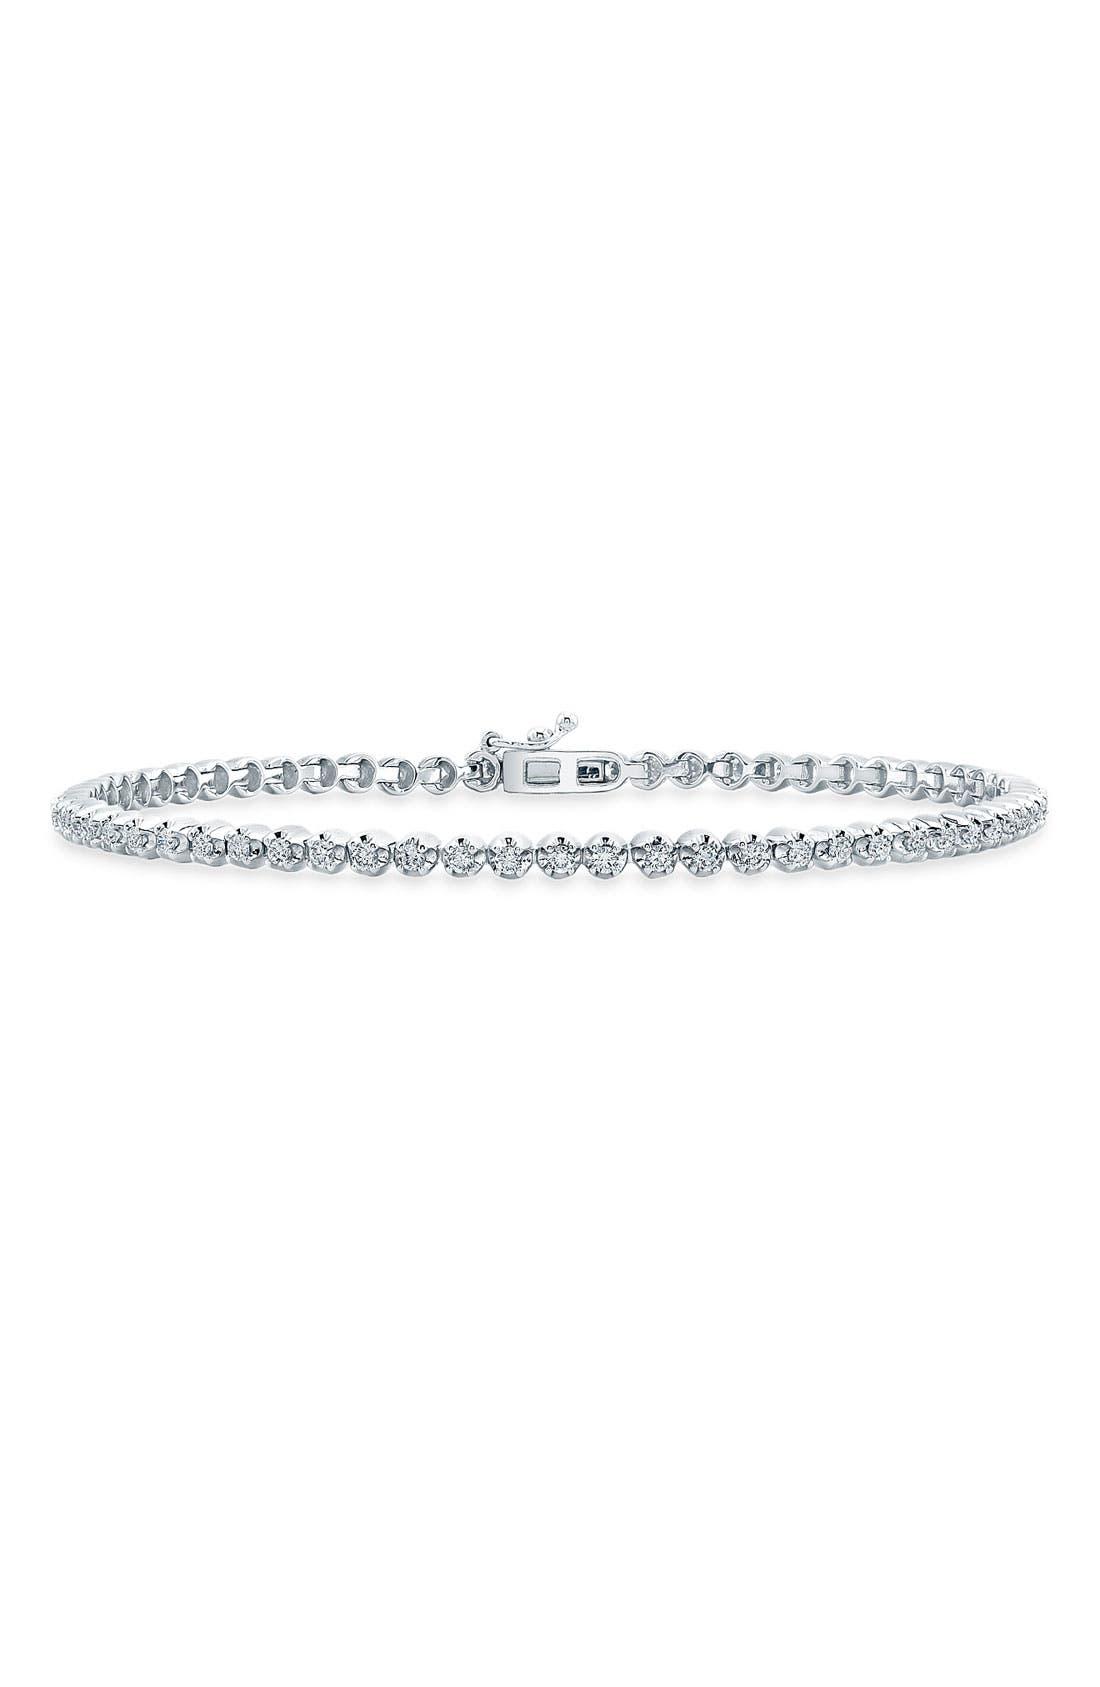 Main Image - Bony Levy Diamond Line Bracelet (Nordstrom Exclusive) (Limited Edition)